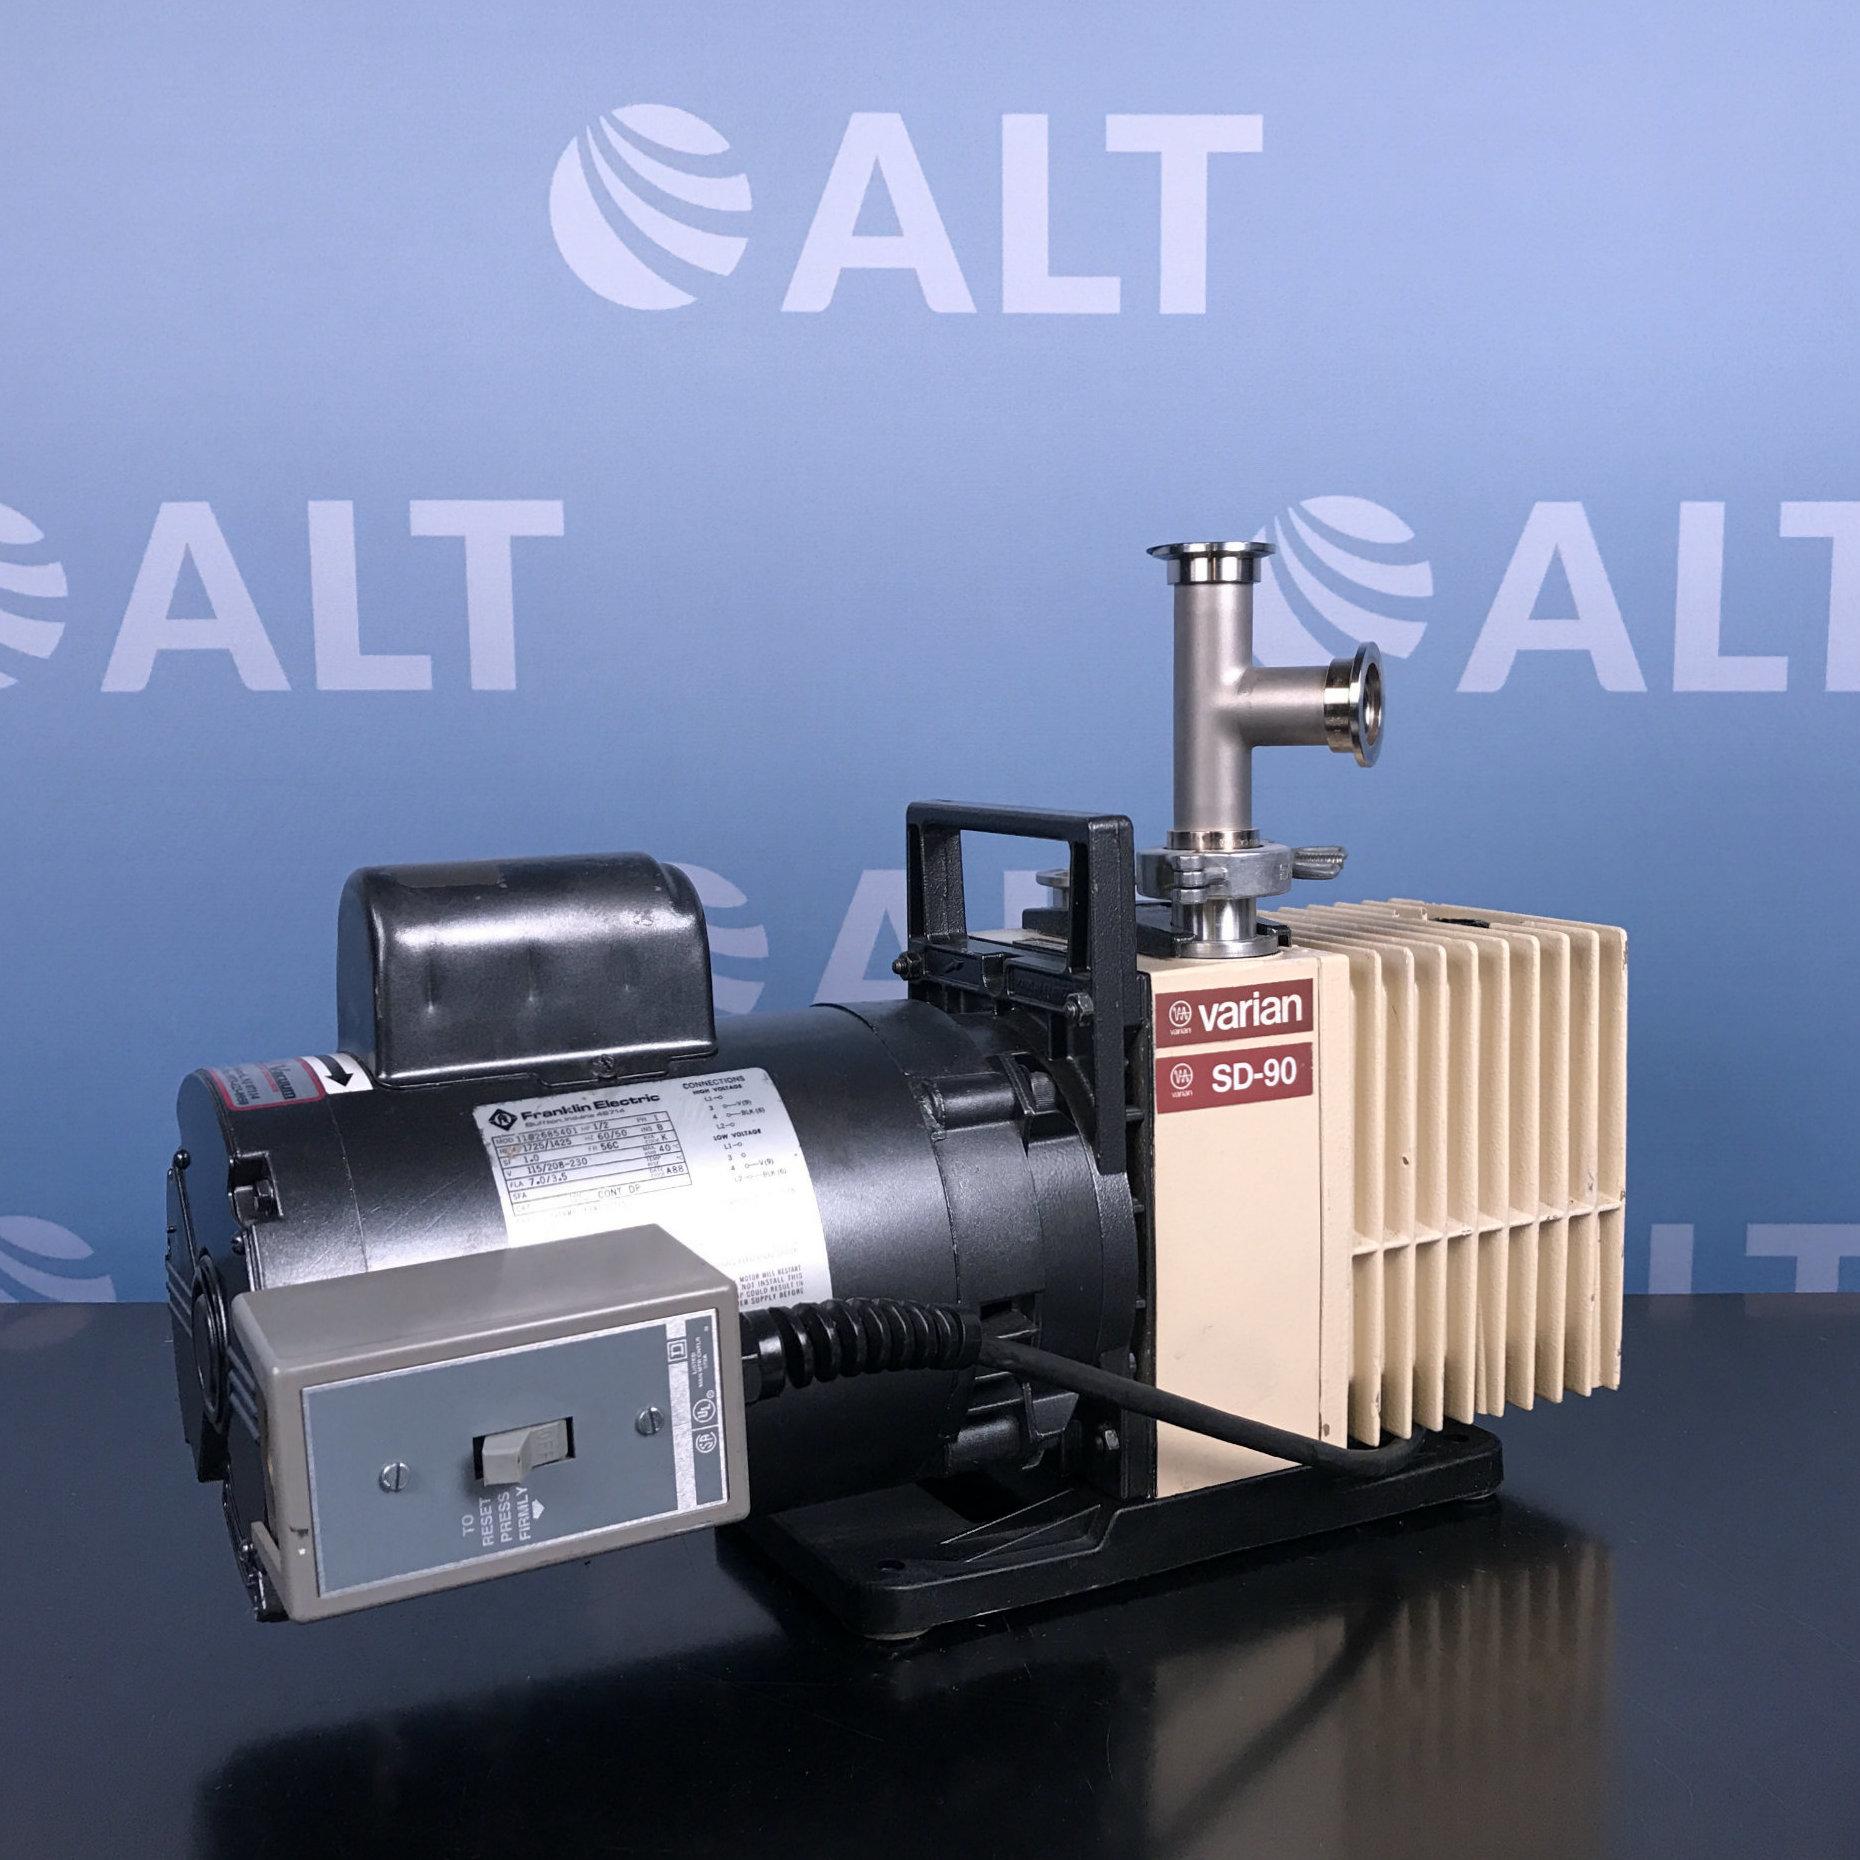 Varian SD-90 Dual Stage Rotary Vane Vacuum Pump Image